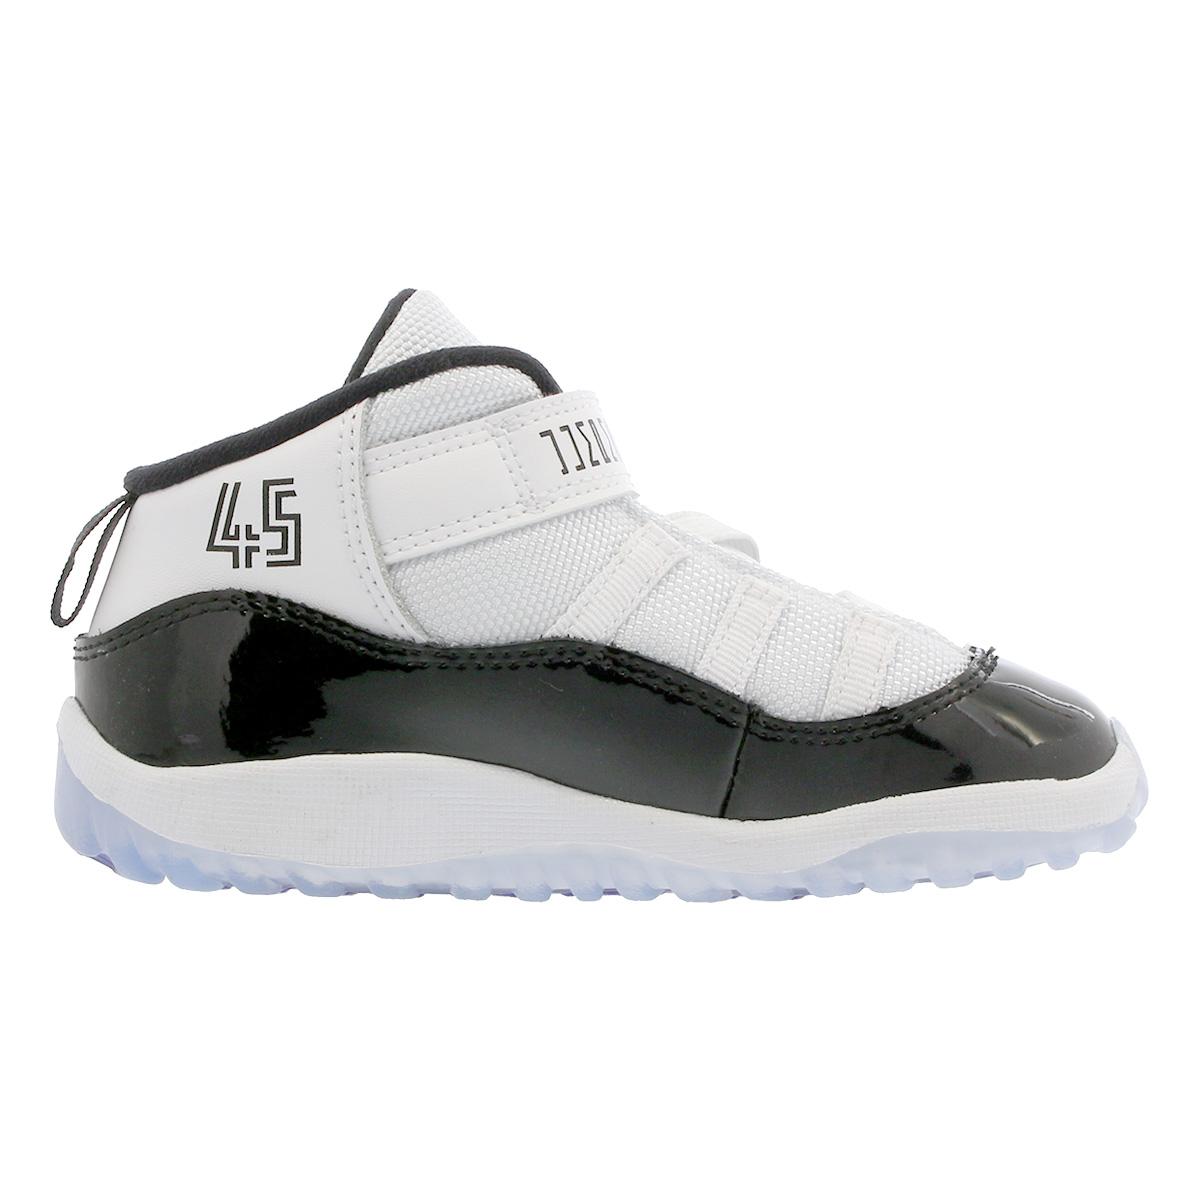 NIKE AIR JORDAN 11 RETRO BT Nike Air Jordan 11 nostalgic BT WHITE CONCORD BLACK  378 418636419